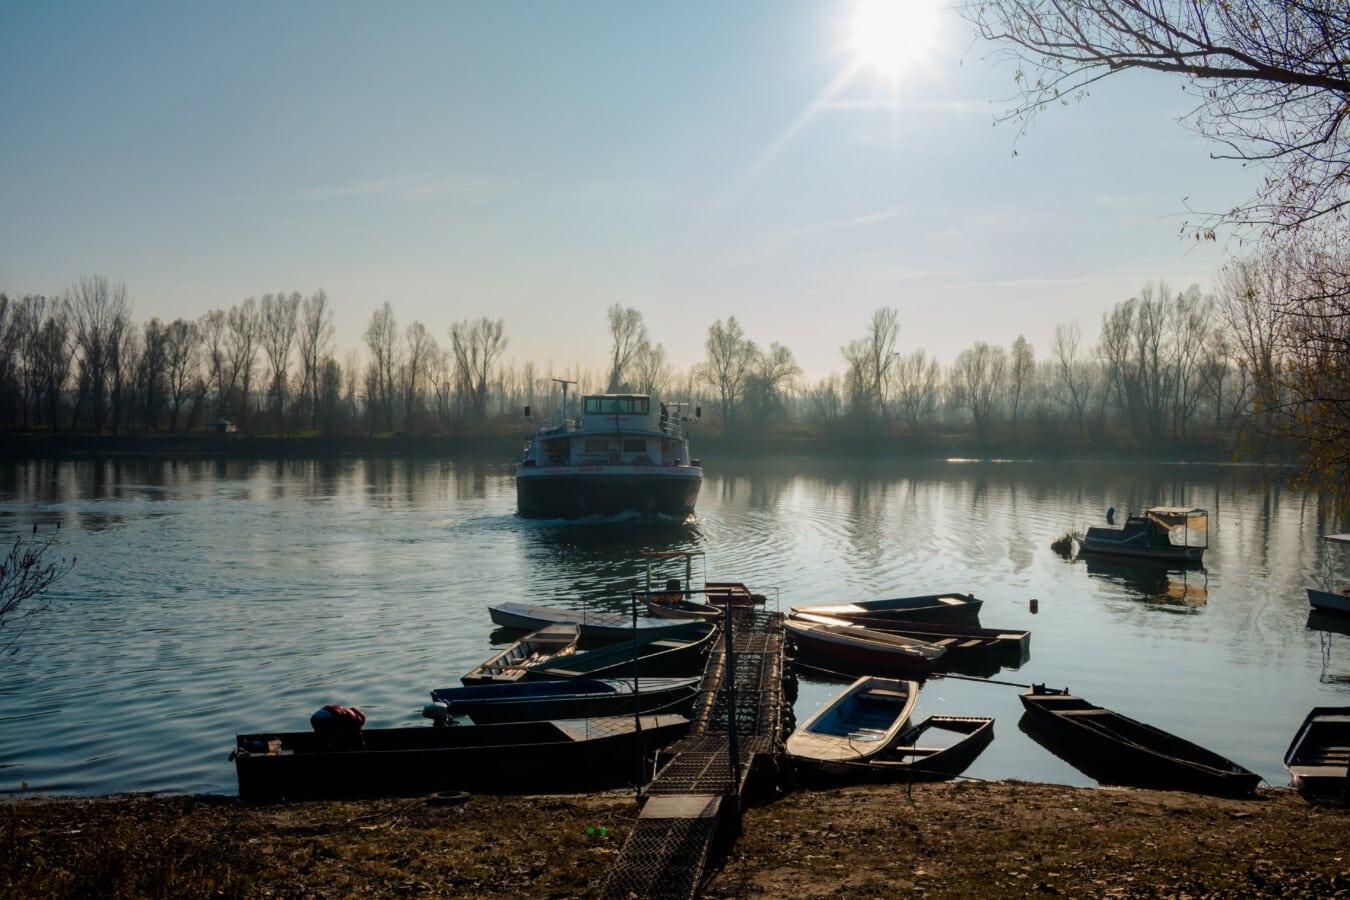 tugboat, ship, river, river boat, riverbank, shore, lake, lakeside, boat, shed